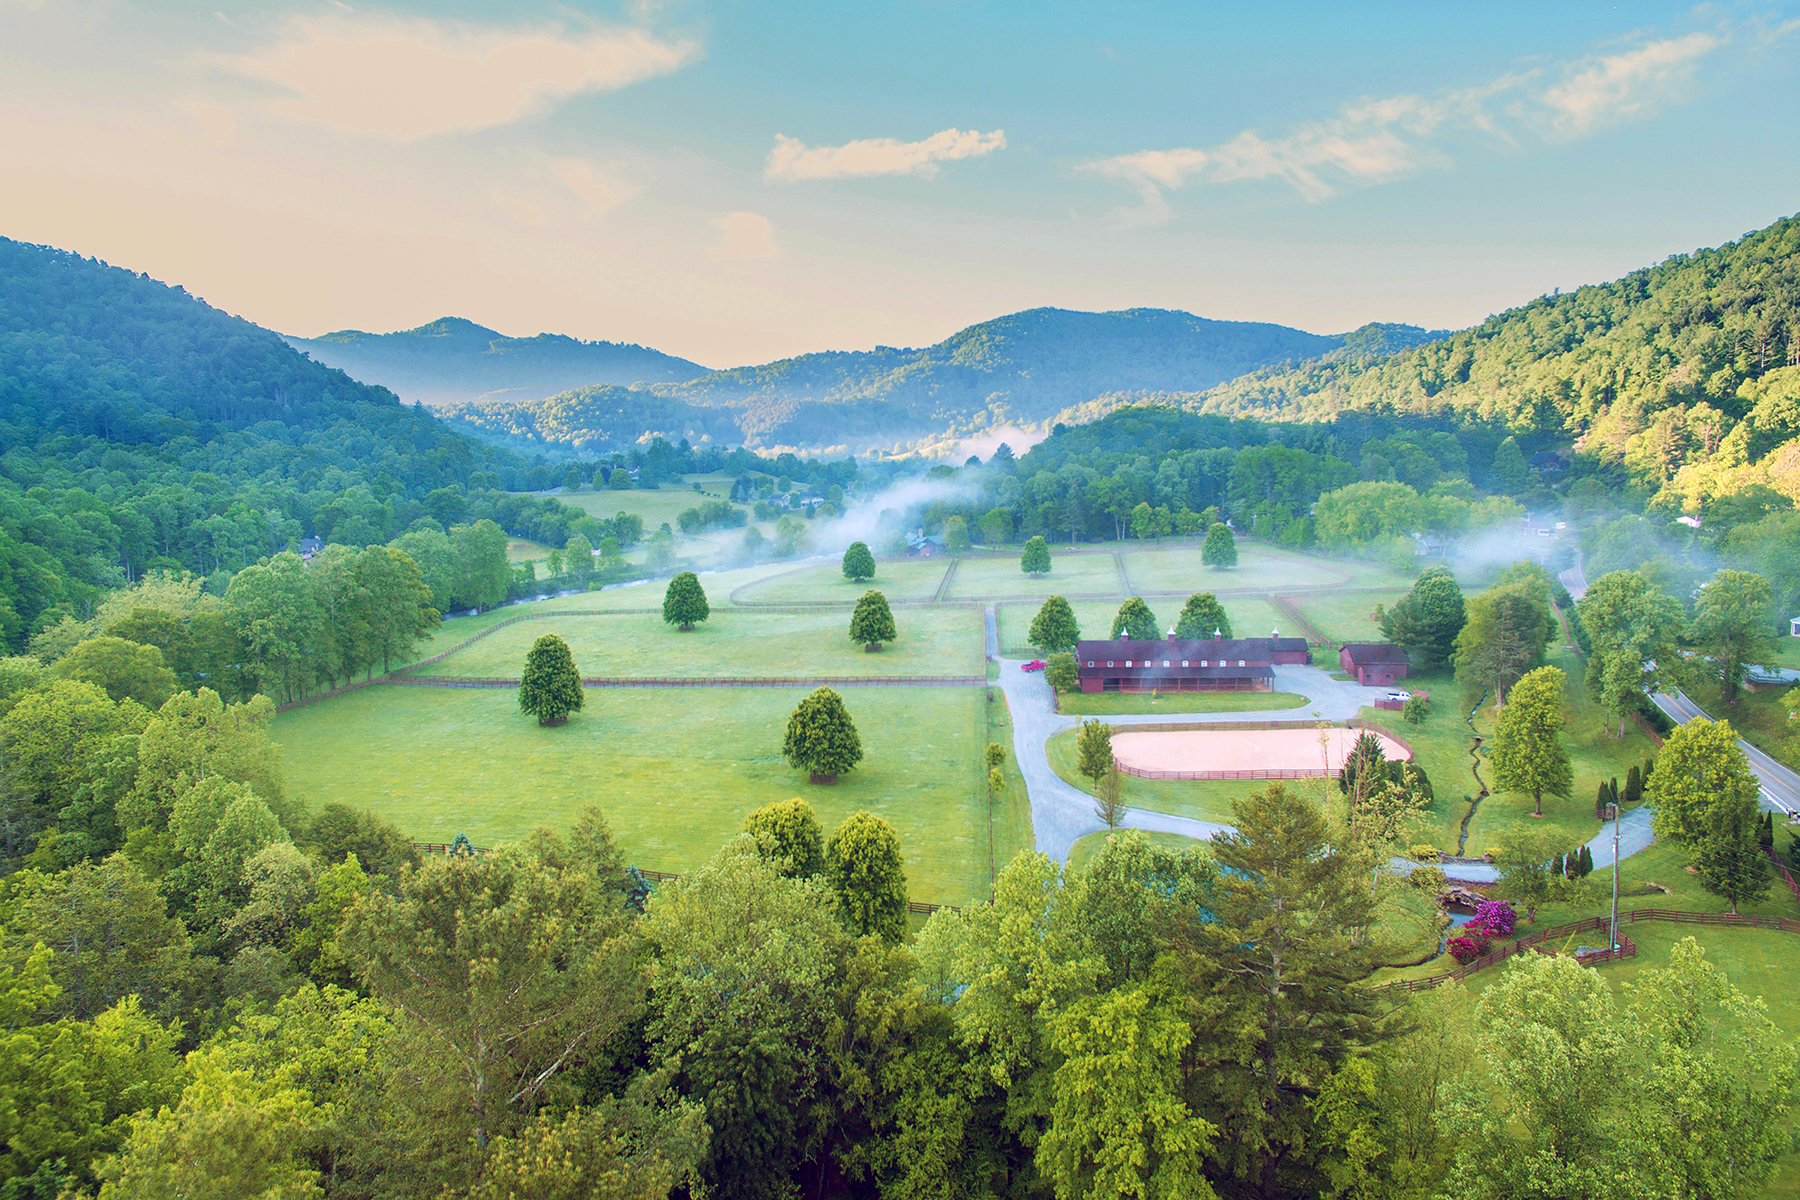 Farm / Ranch / Plantation for Sale at RIVER RUN FARM - VALLE CRUCIS 2128-2130 Broadstone Road Banner Elk, North Carolina 28604 United States